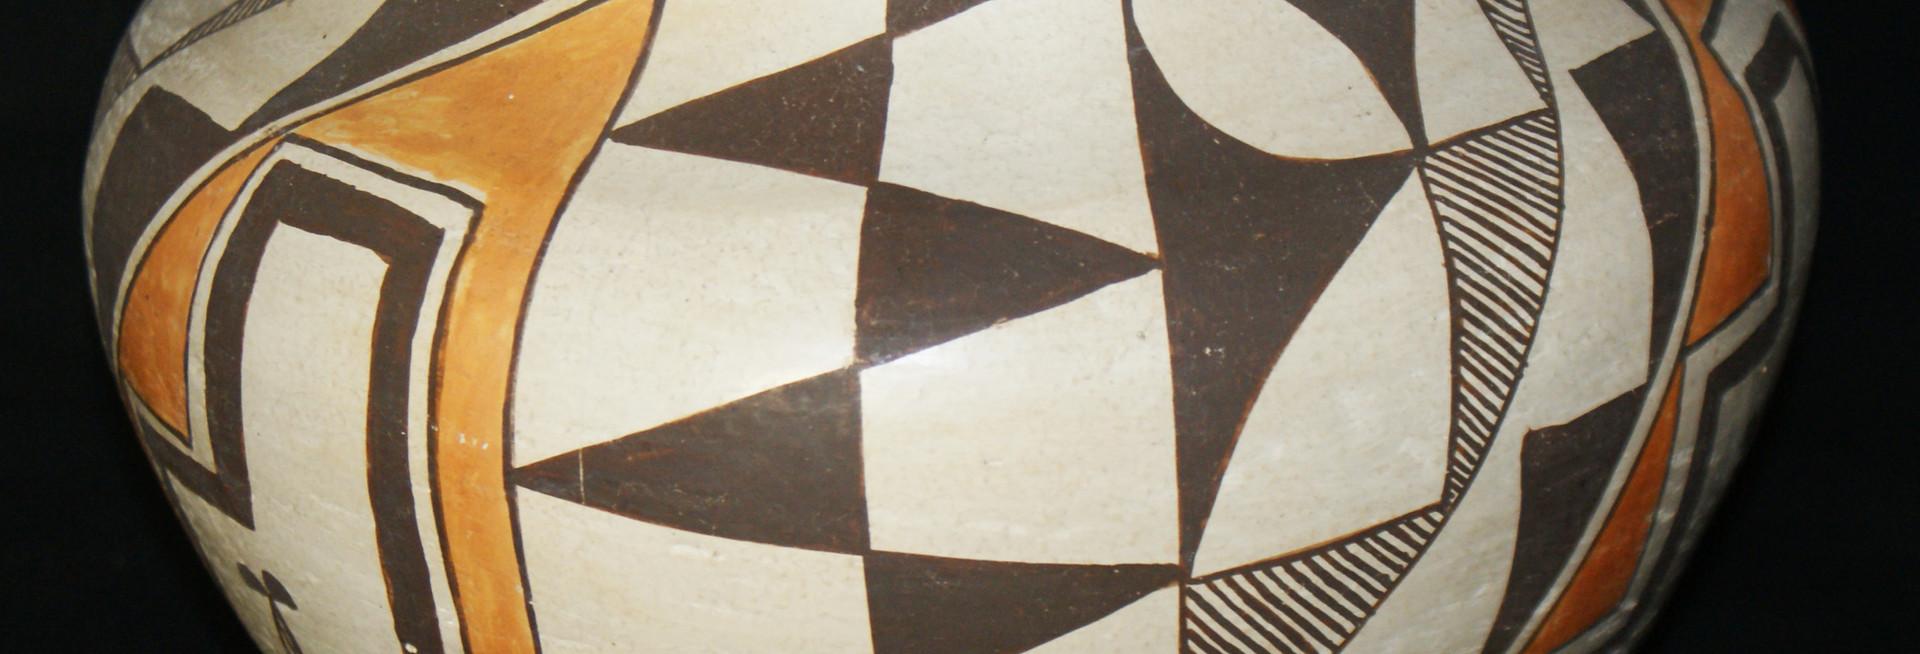 Acoma Pueblo Polychrome Pottery Jar with Fine Line and Geometric Designs C. 1940's